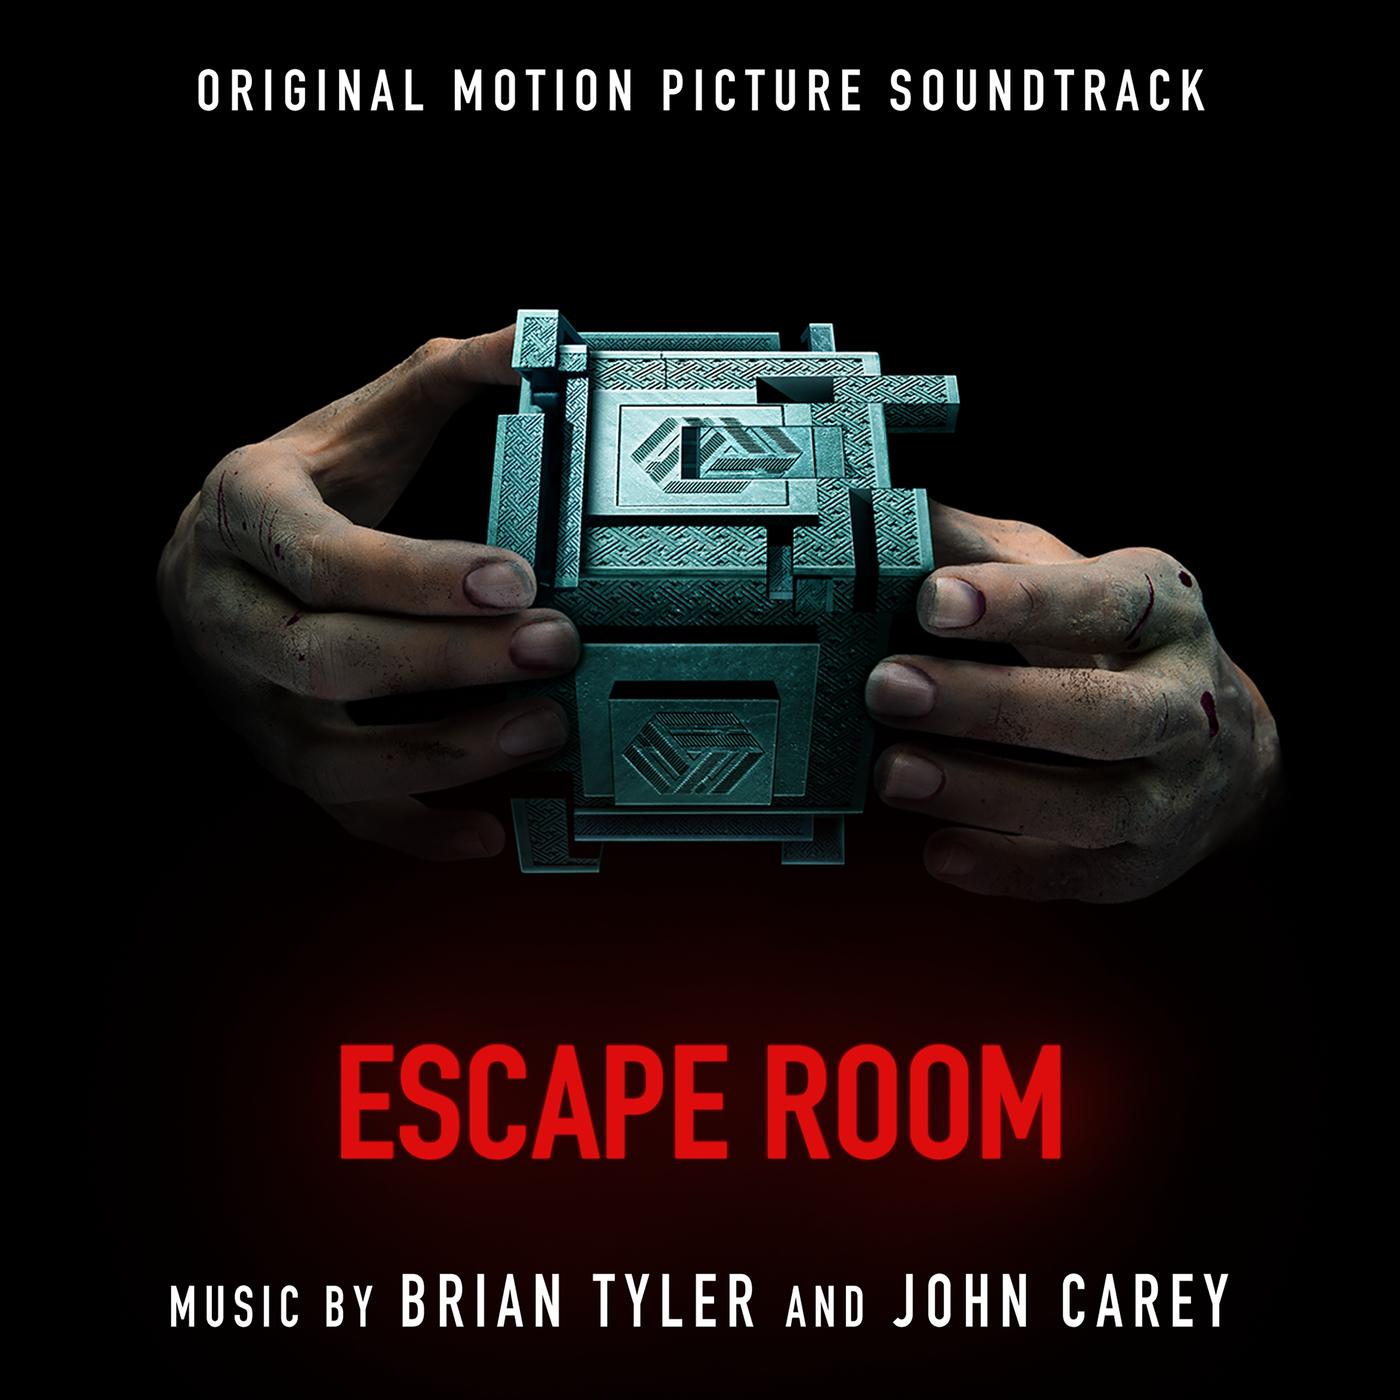 Escape Room (Original Motion Picture Soundtrack) - Brian Tyler